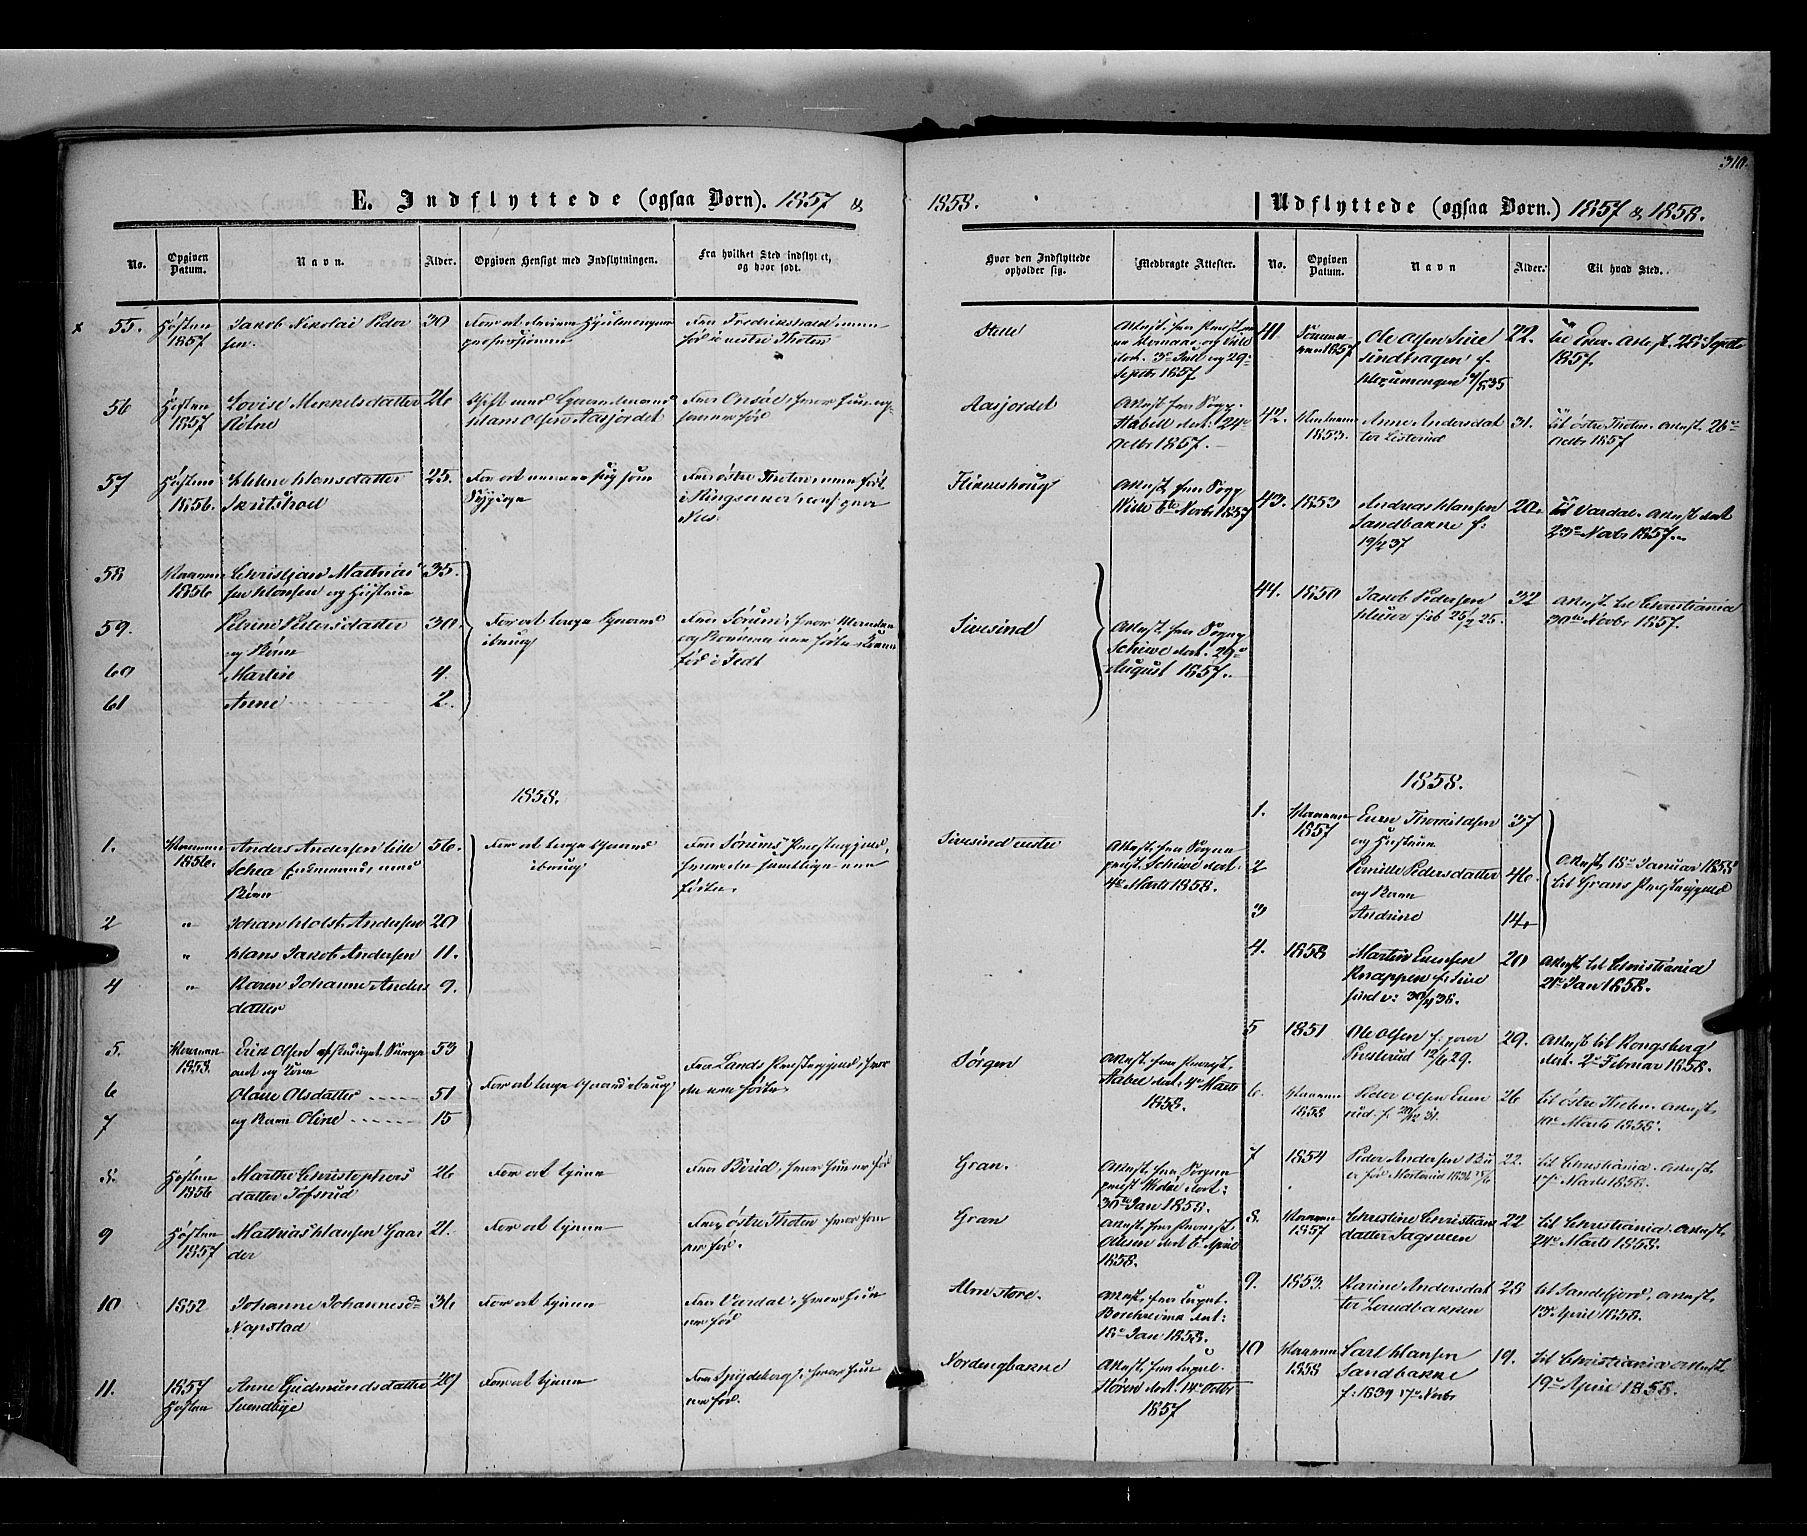 SAH, Vestre Toten prestekontor, H/Ha/Haa/L0006: Ministerialbok nr. 6, 1856-1861, s. 310